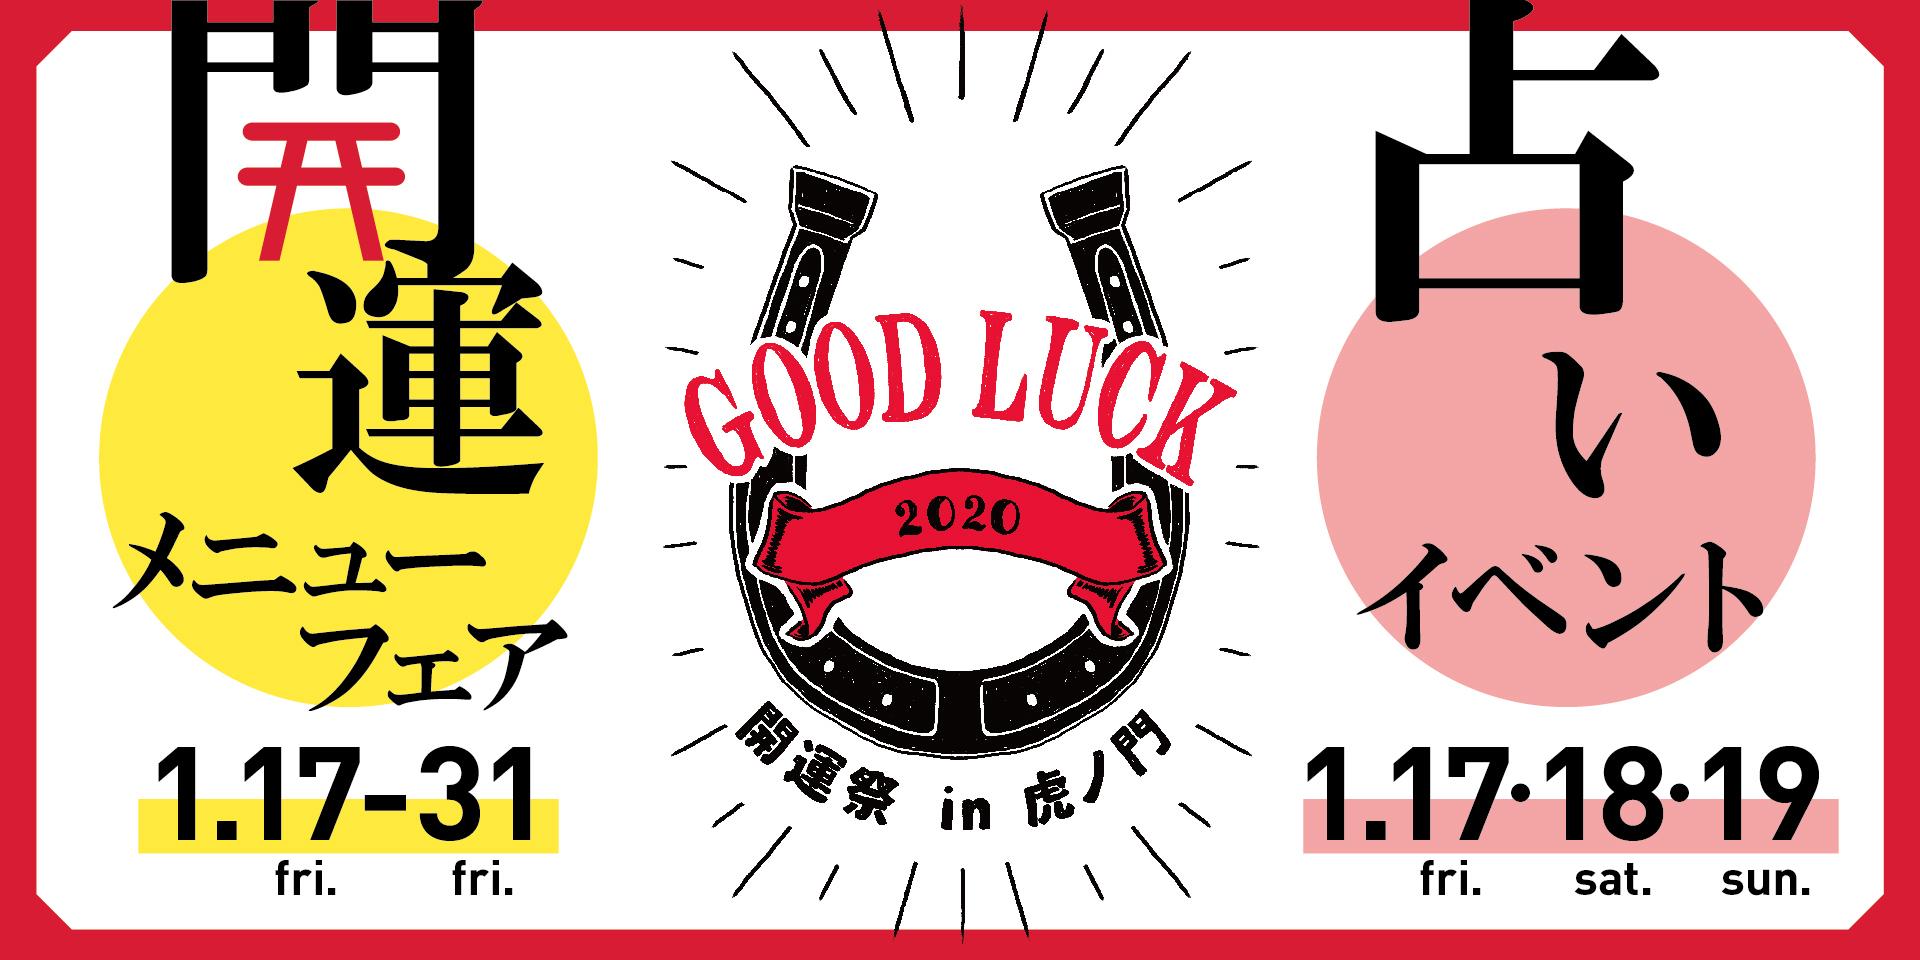 GOOD LUCK 2020~開運祭 in 虎ノ門~